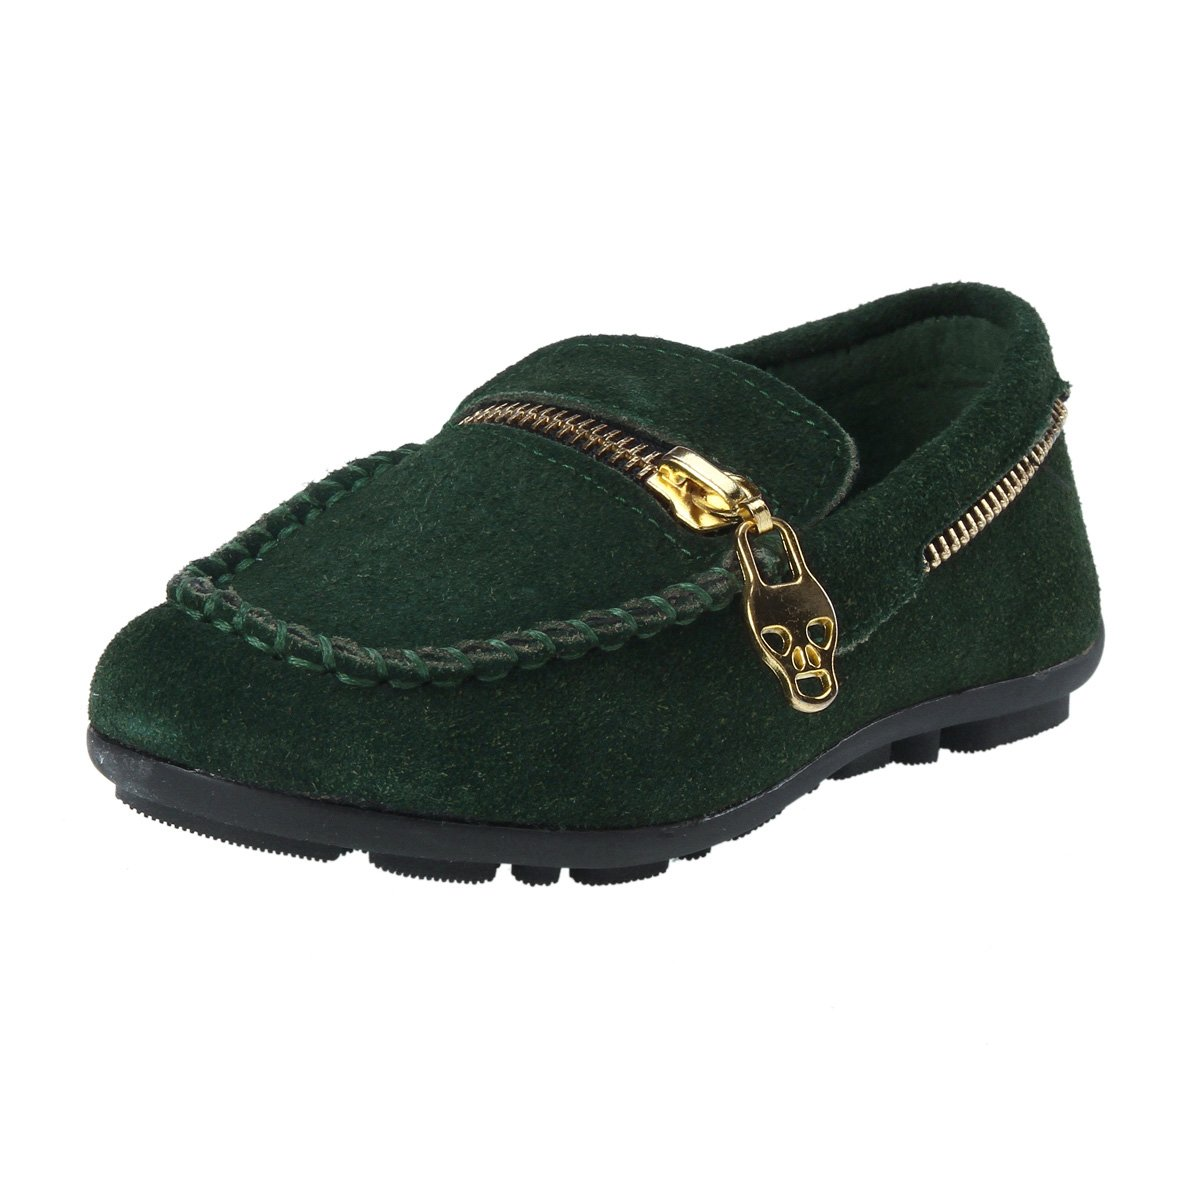 Damara Toddler Suede Stitch Zipper Round Toe Flats,Green,10 M Toddler